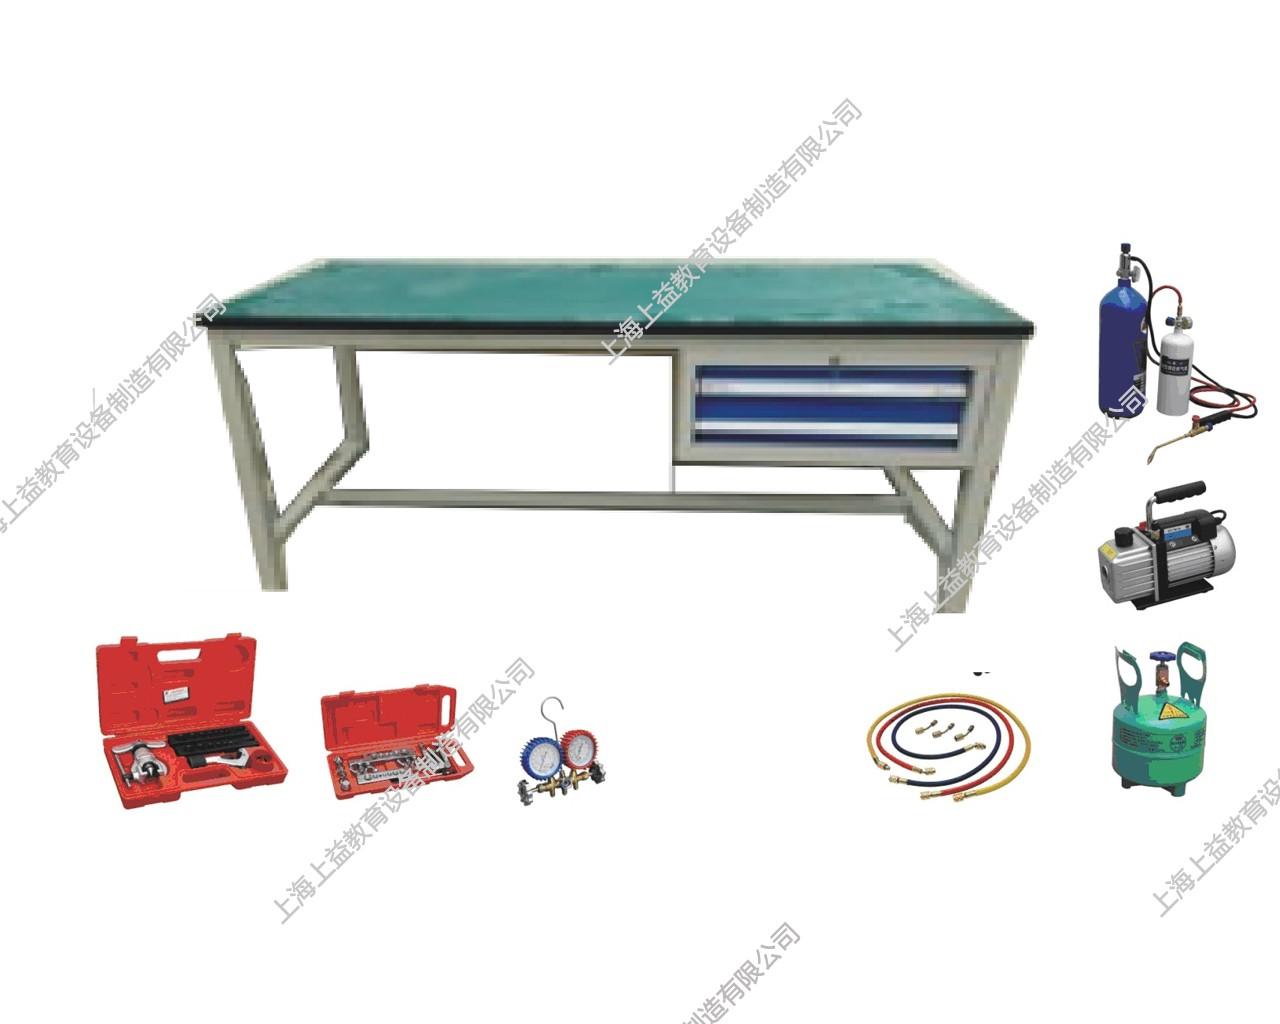 SY-BXKT型 冰箱空调维修wwwlehu8vip室设备